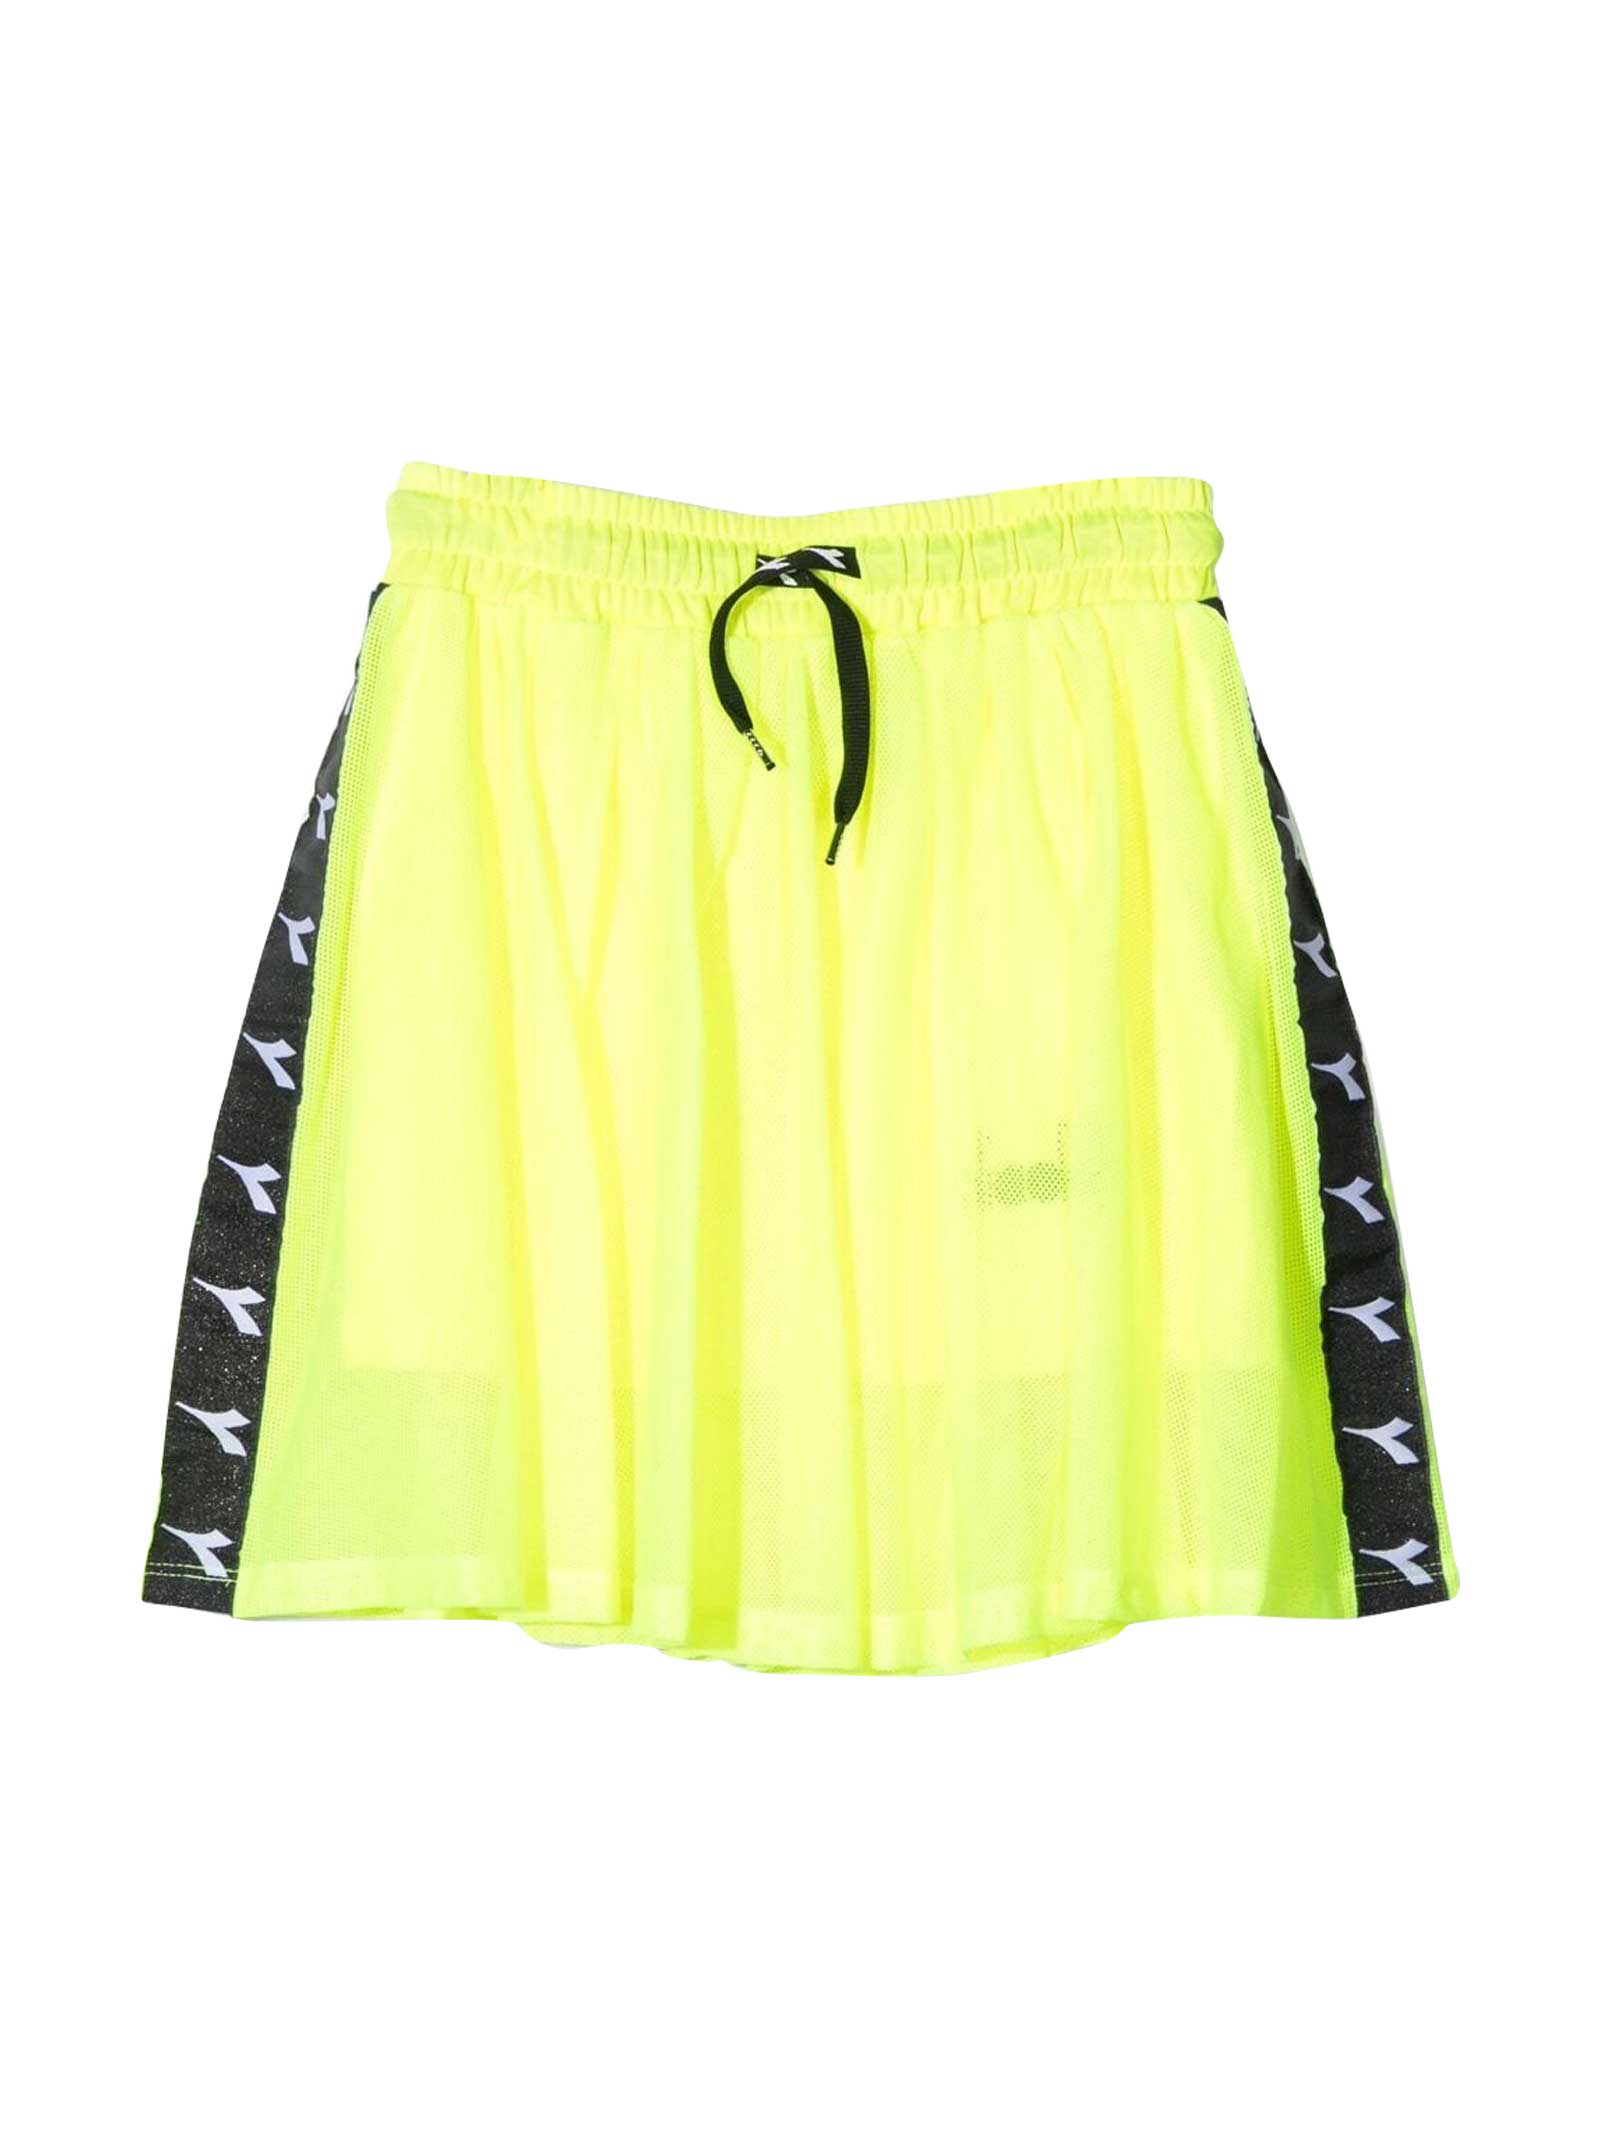 Diadora Diadora Kids Fluo Yellow Teen Skirt